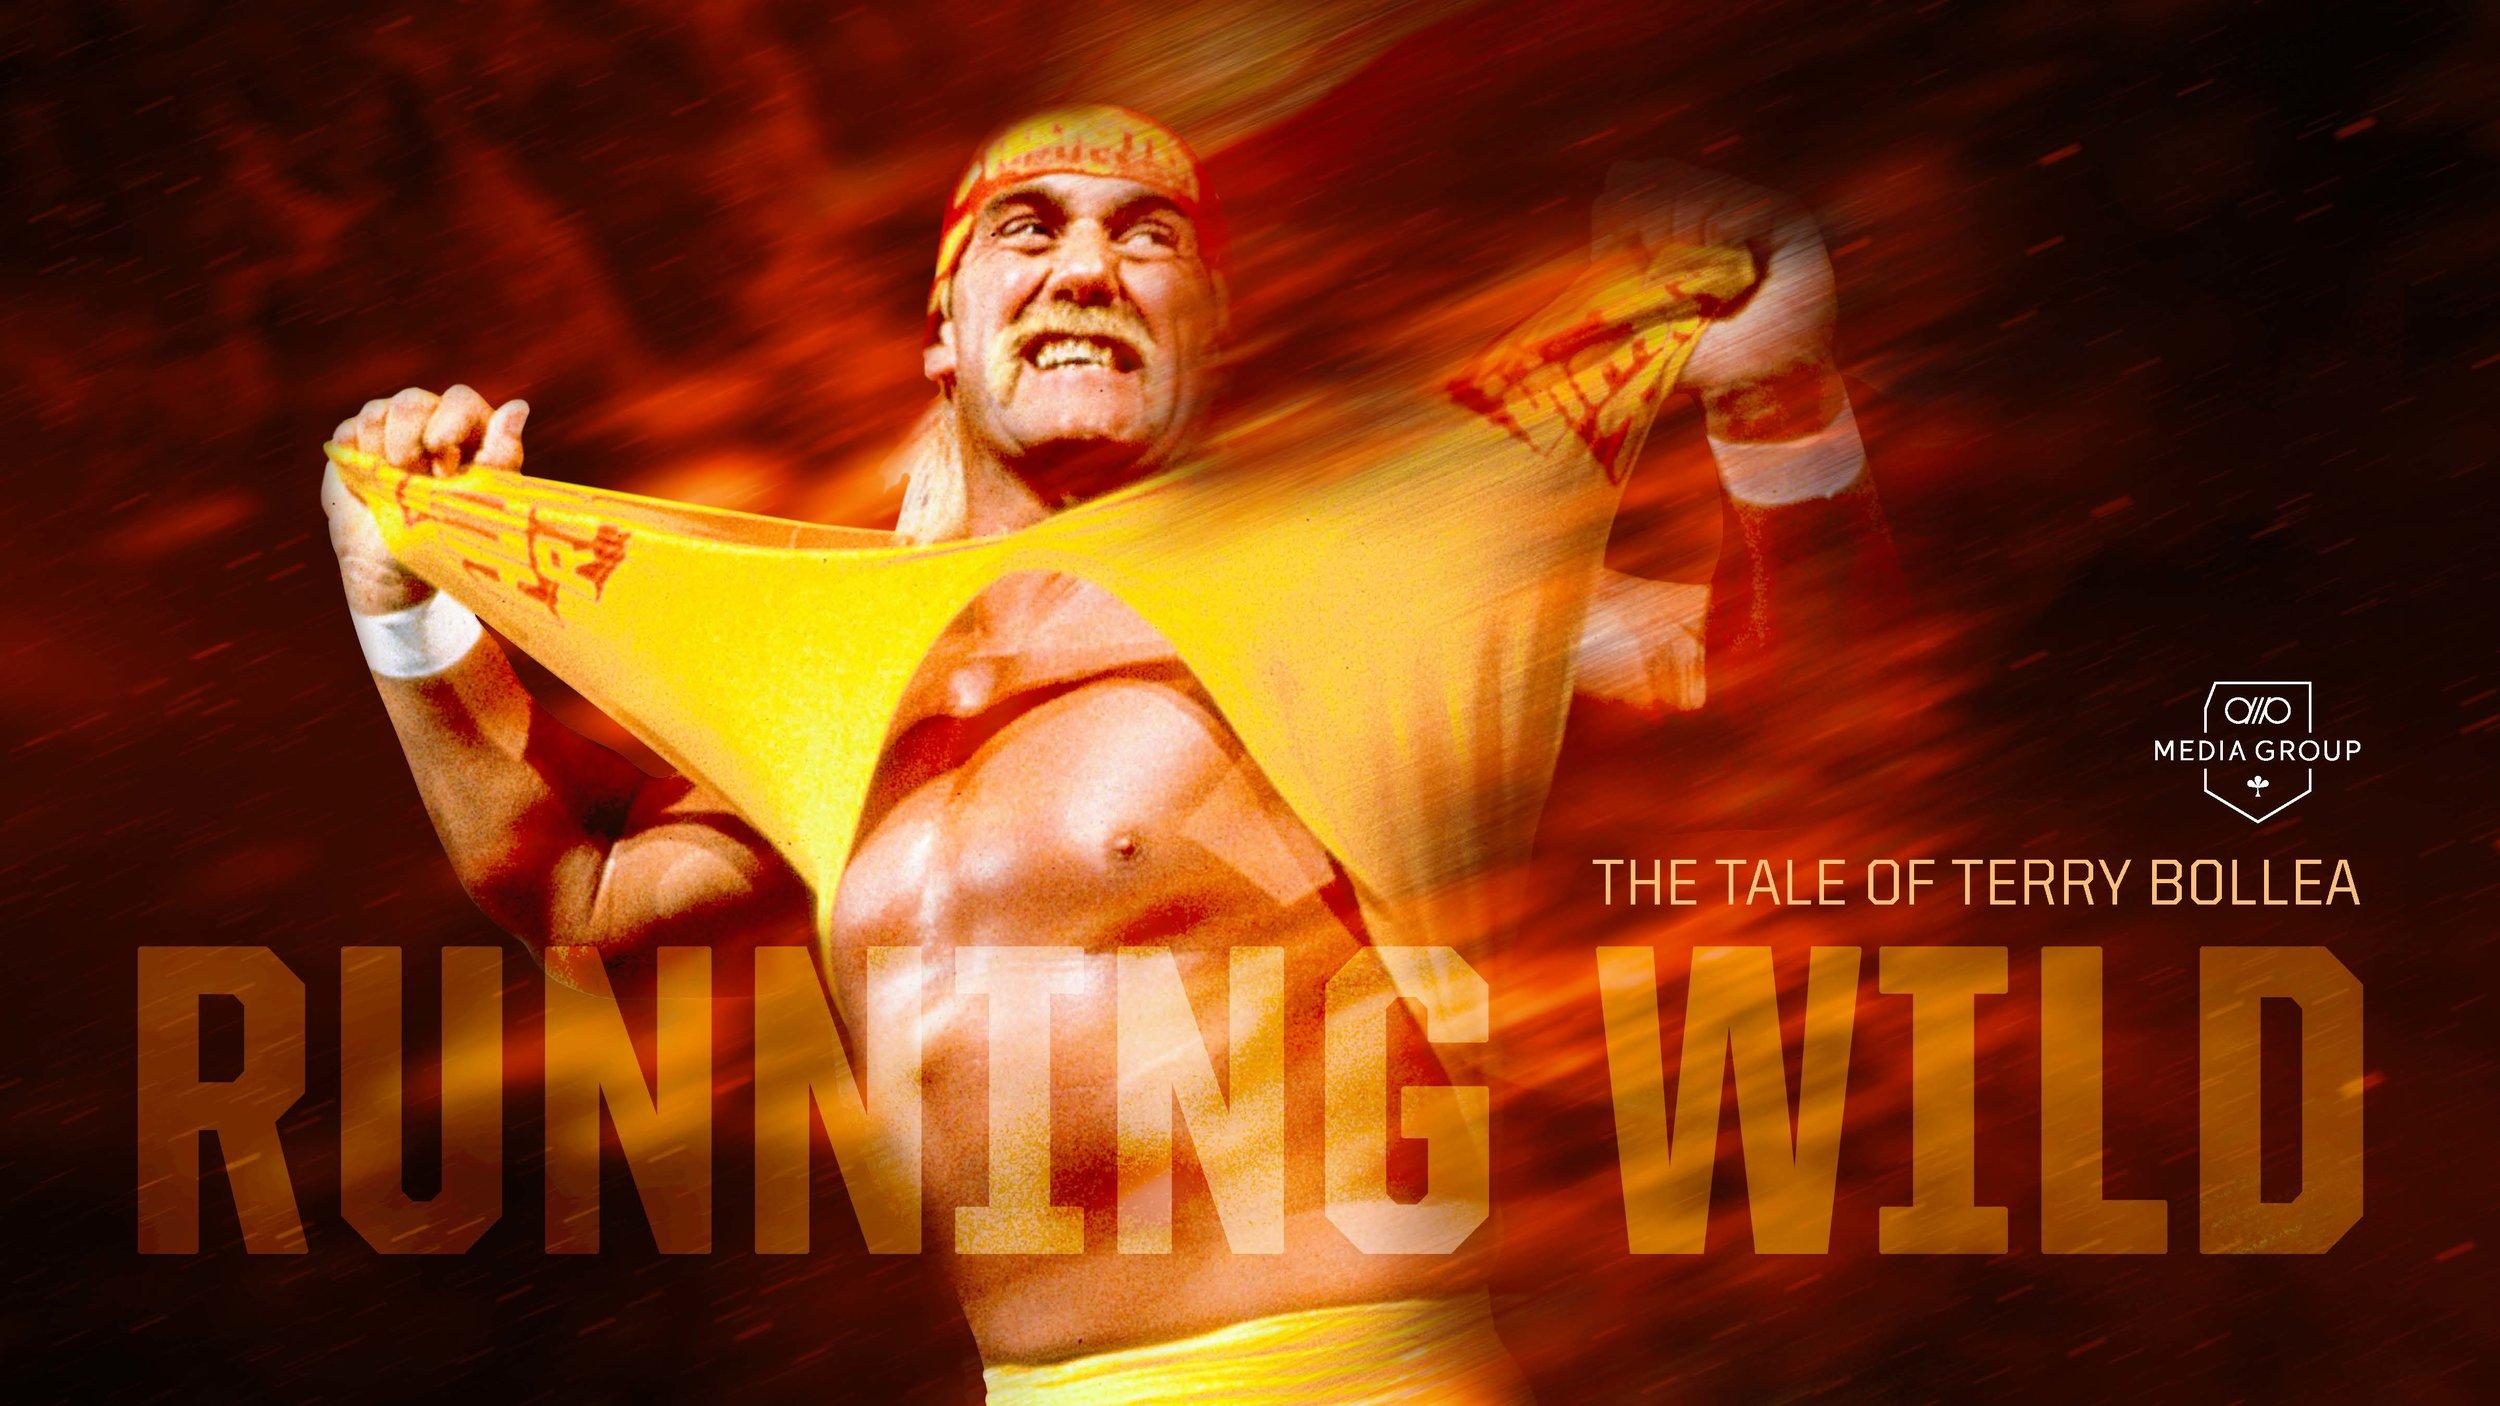 Hulk-Hogan-deck_Page_01_Image_0001.jpg